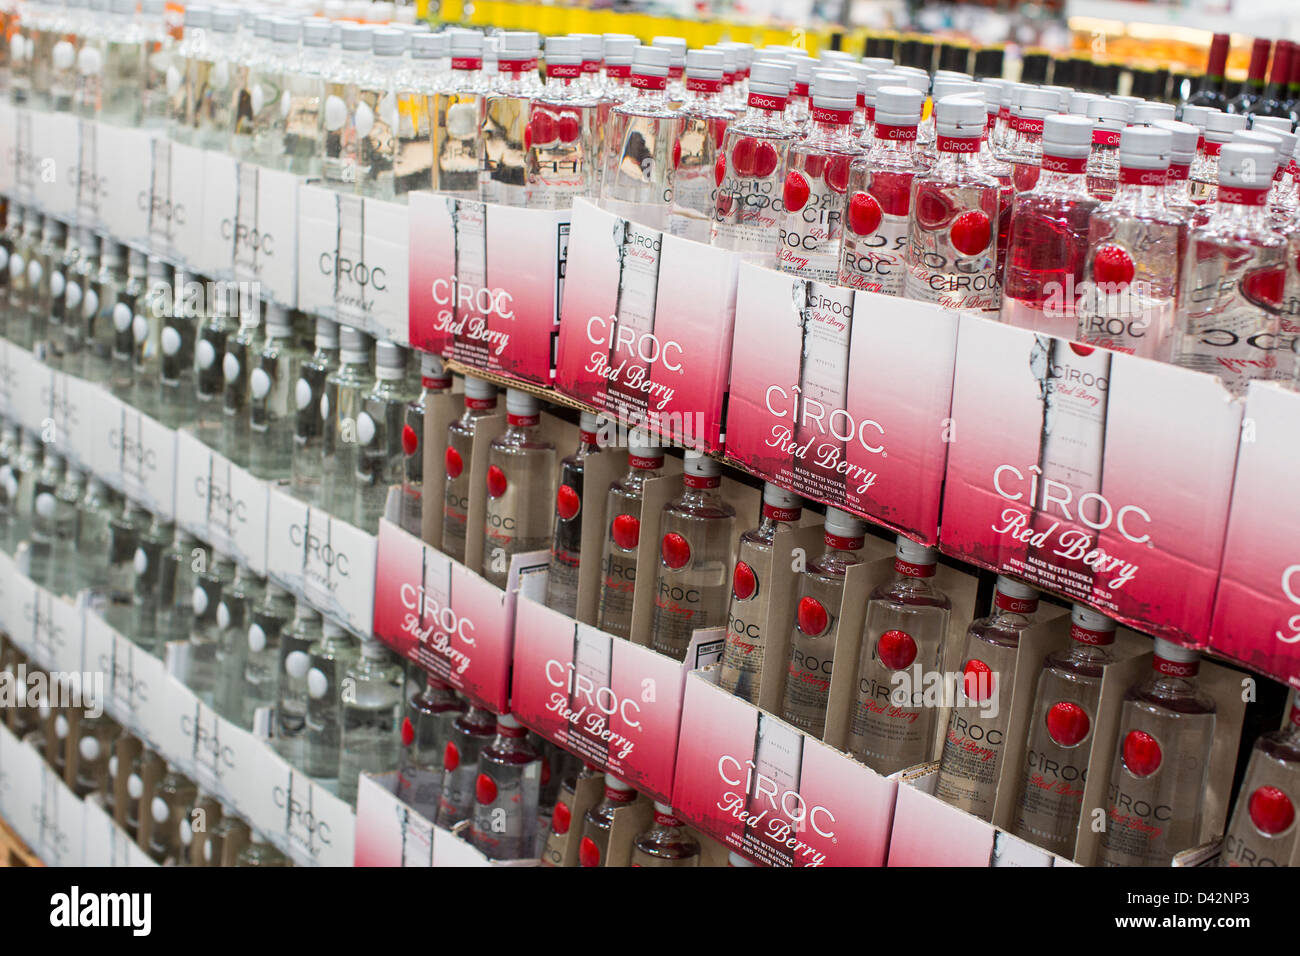 Ciroc vodka on display at a costco wholesale warehouse club stock ciroc vodka on display at a costco wholesale warehouse club thecheapjerseys Images